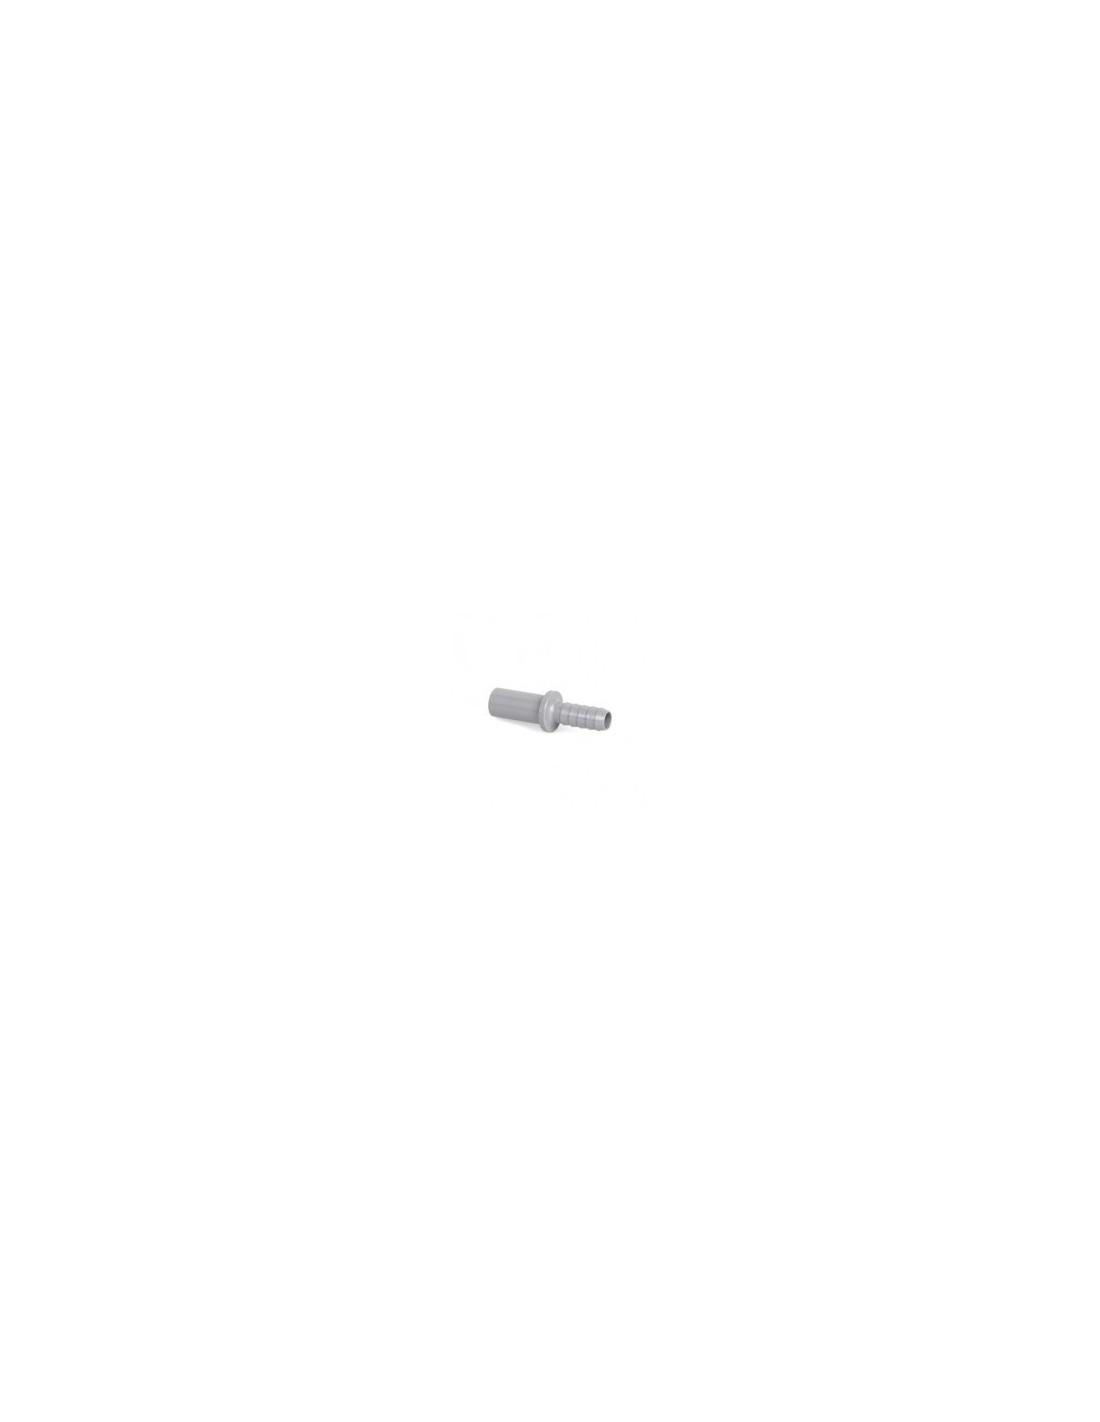 "SPO00122 - JG tube to hose stem 9.5 x 8 mm (3/8"" x 5/16"") (pi251210s)"